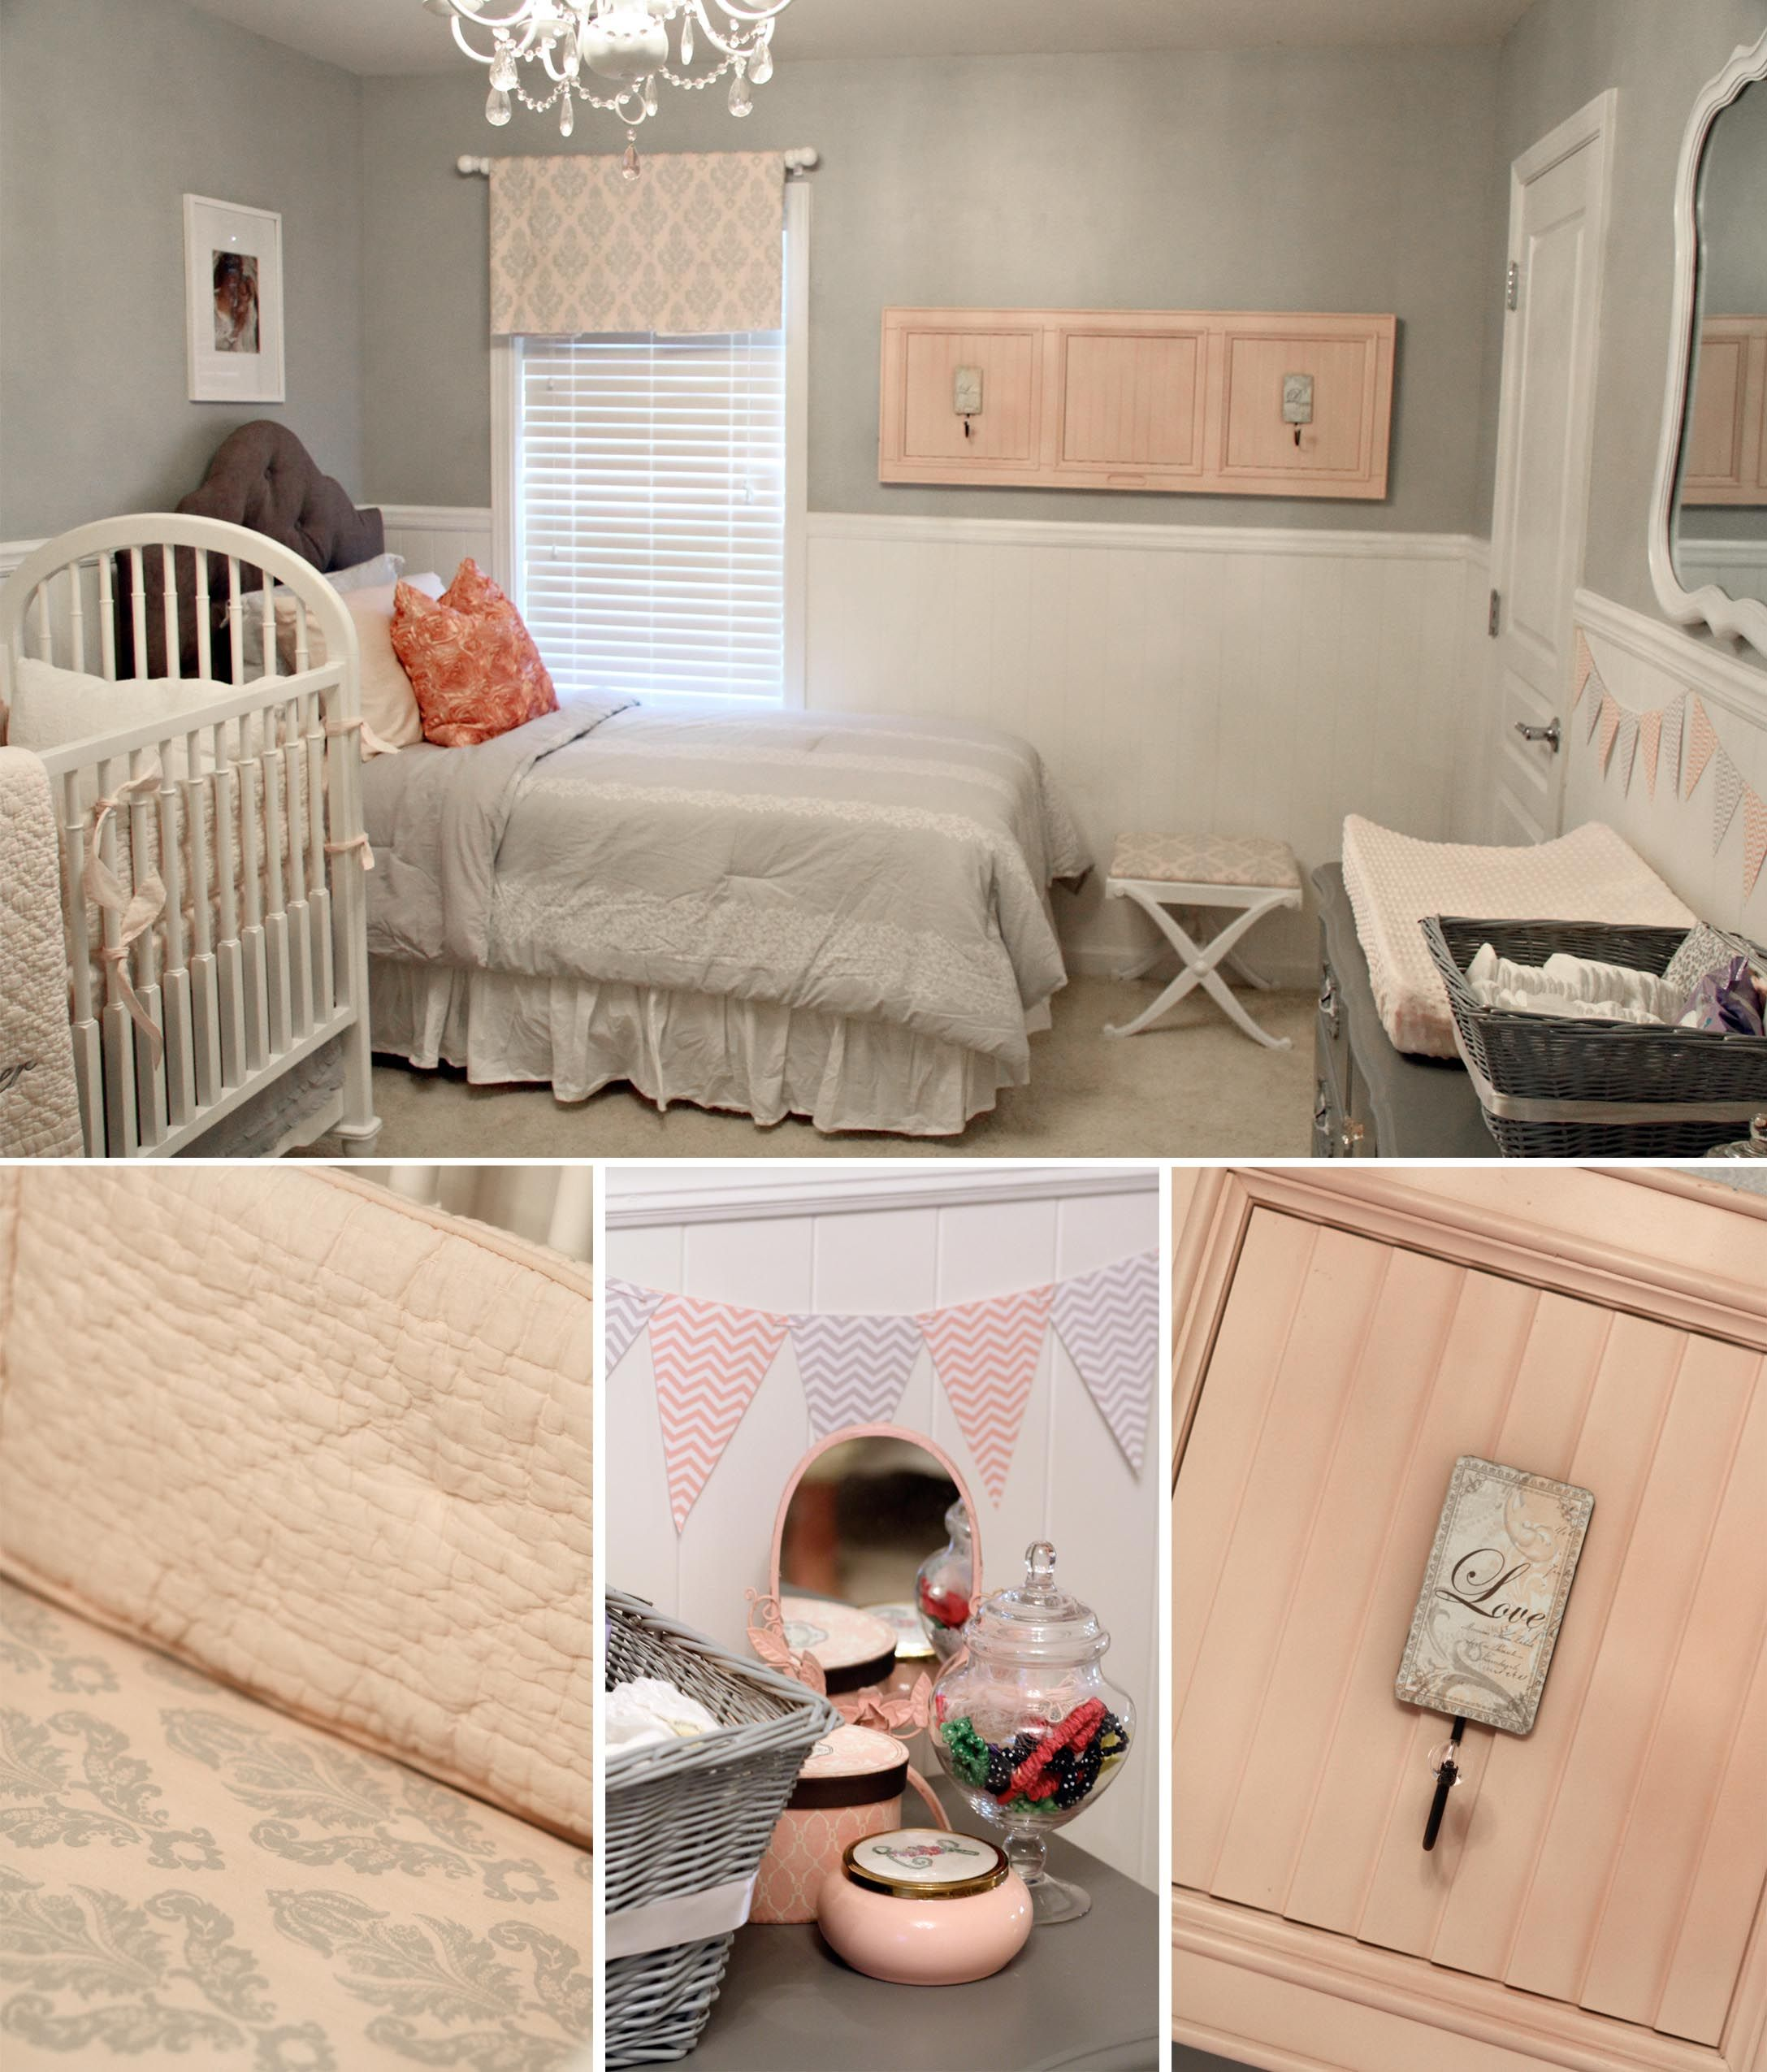 Nursery Layout Twin Bed By Window Crib By Bed Dresser